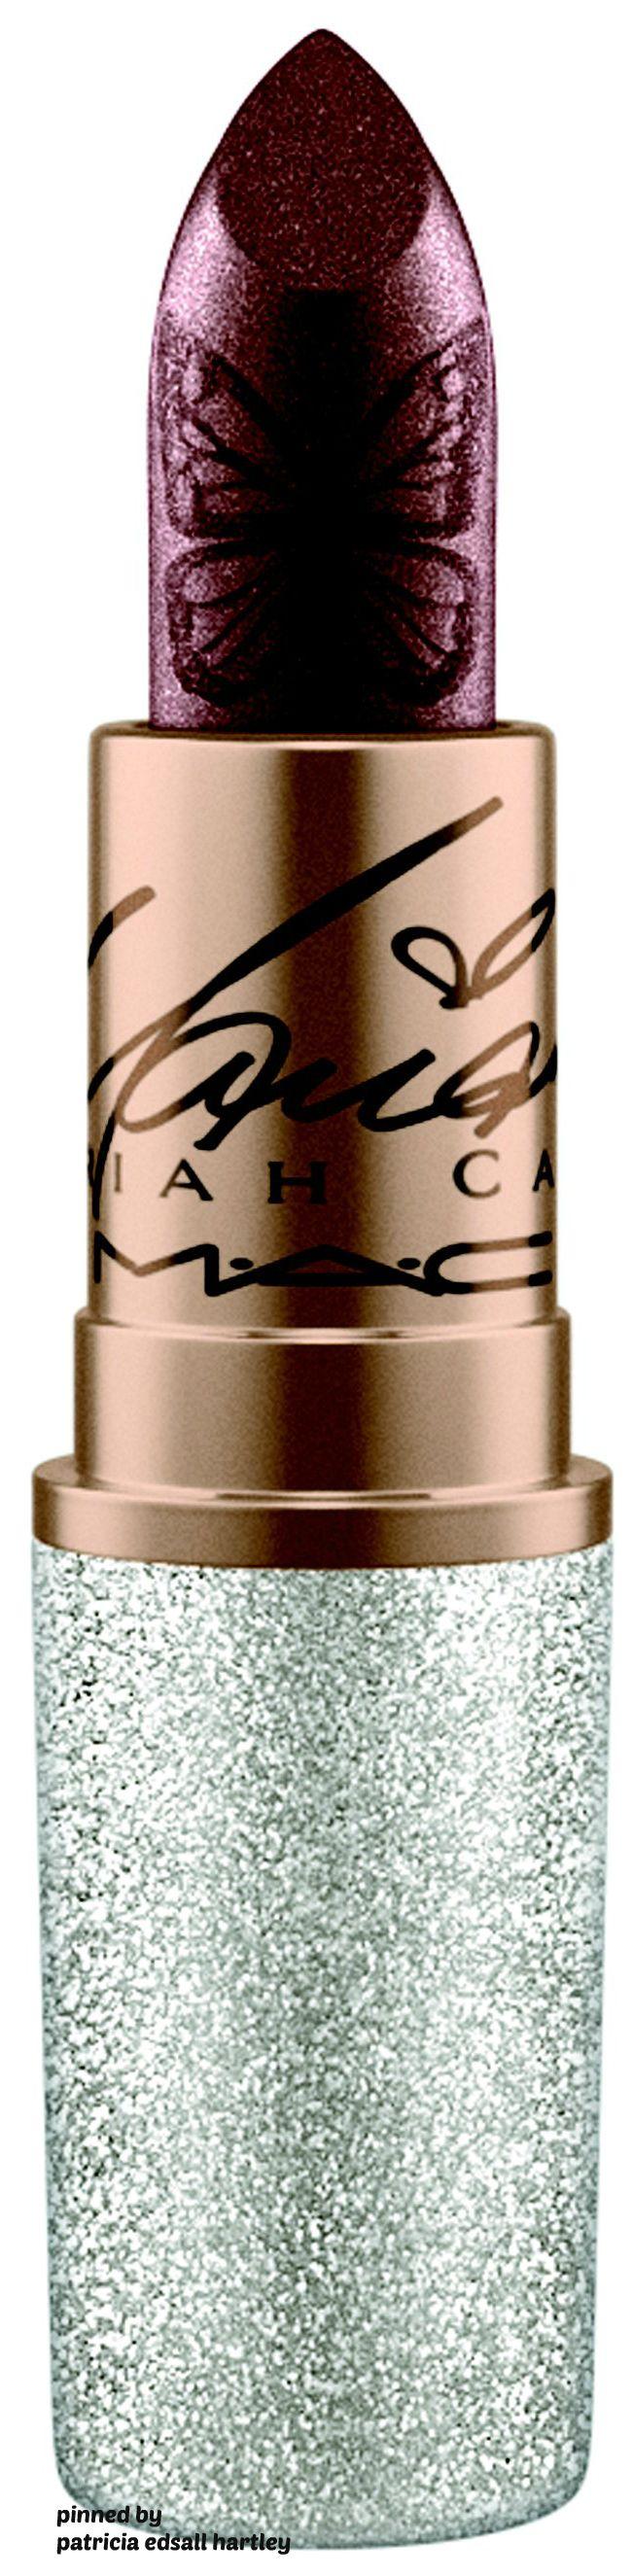 MAC Cosmetics x Mariah Carey Lipstick in I Get So OOC